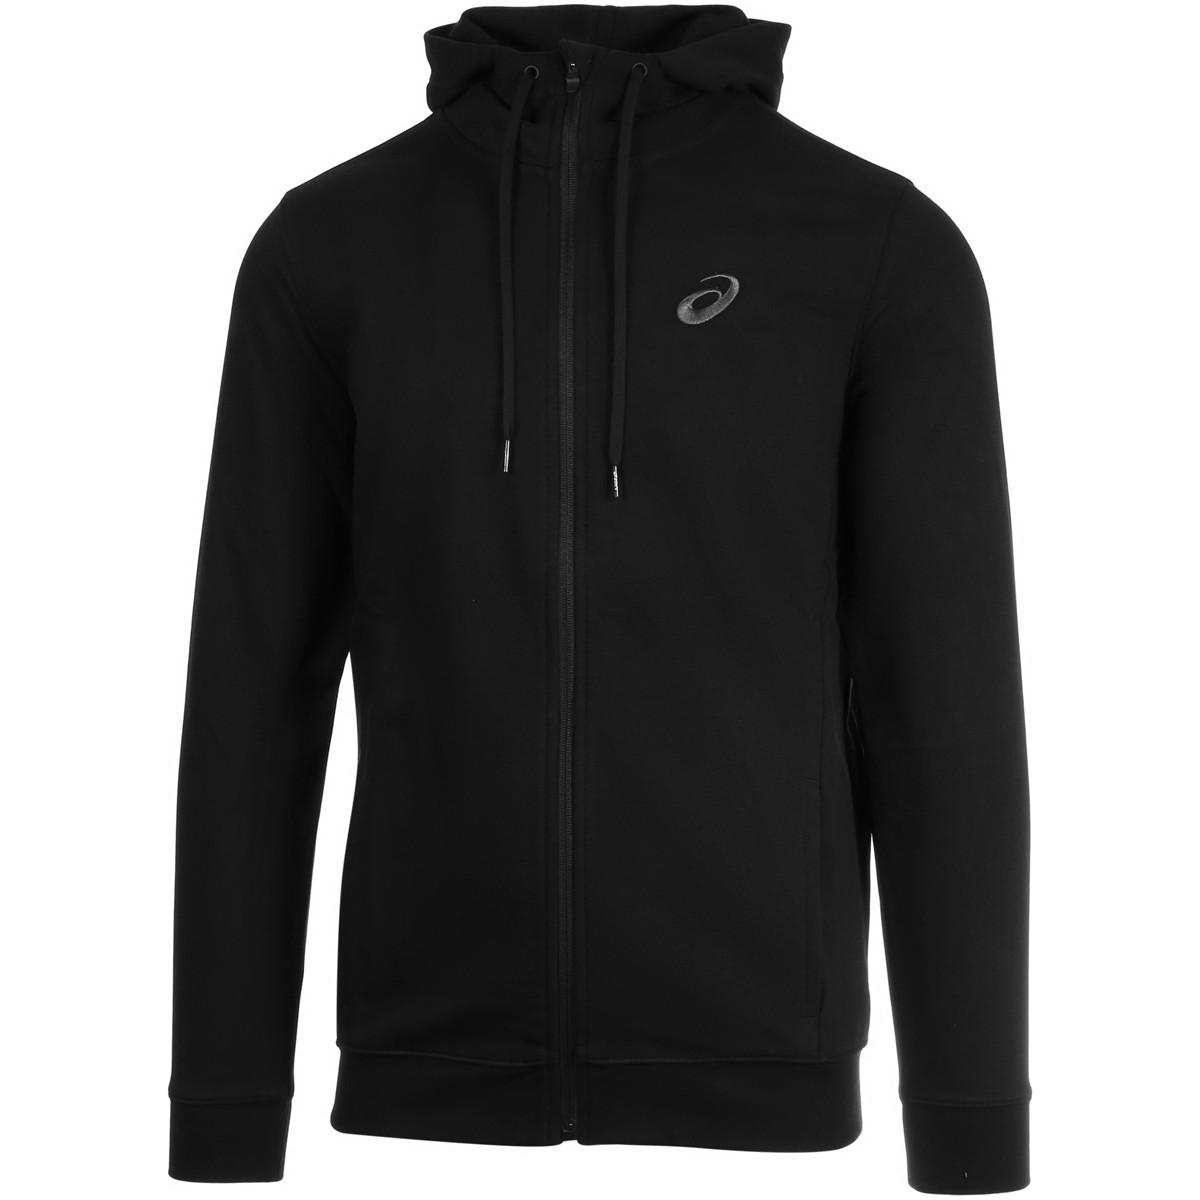 ASICS ZIPPED HOODIE - ASICS - Men's - Clothing | Tennispro